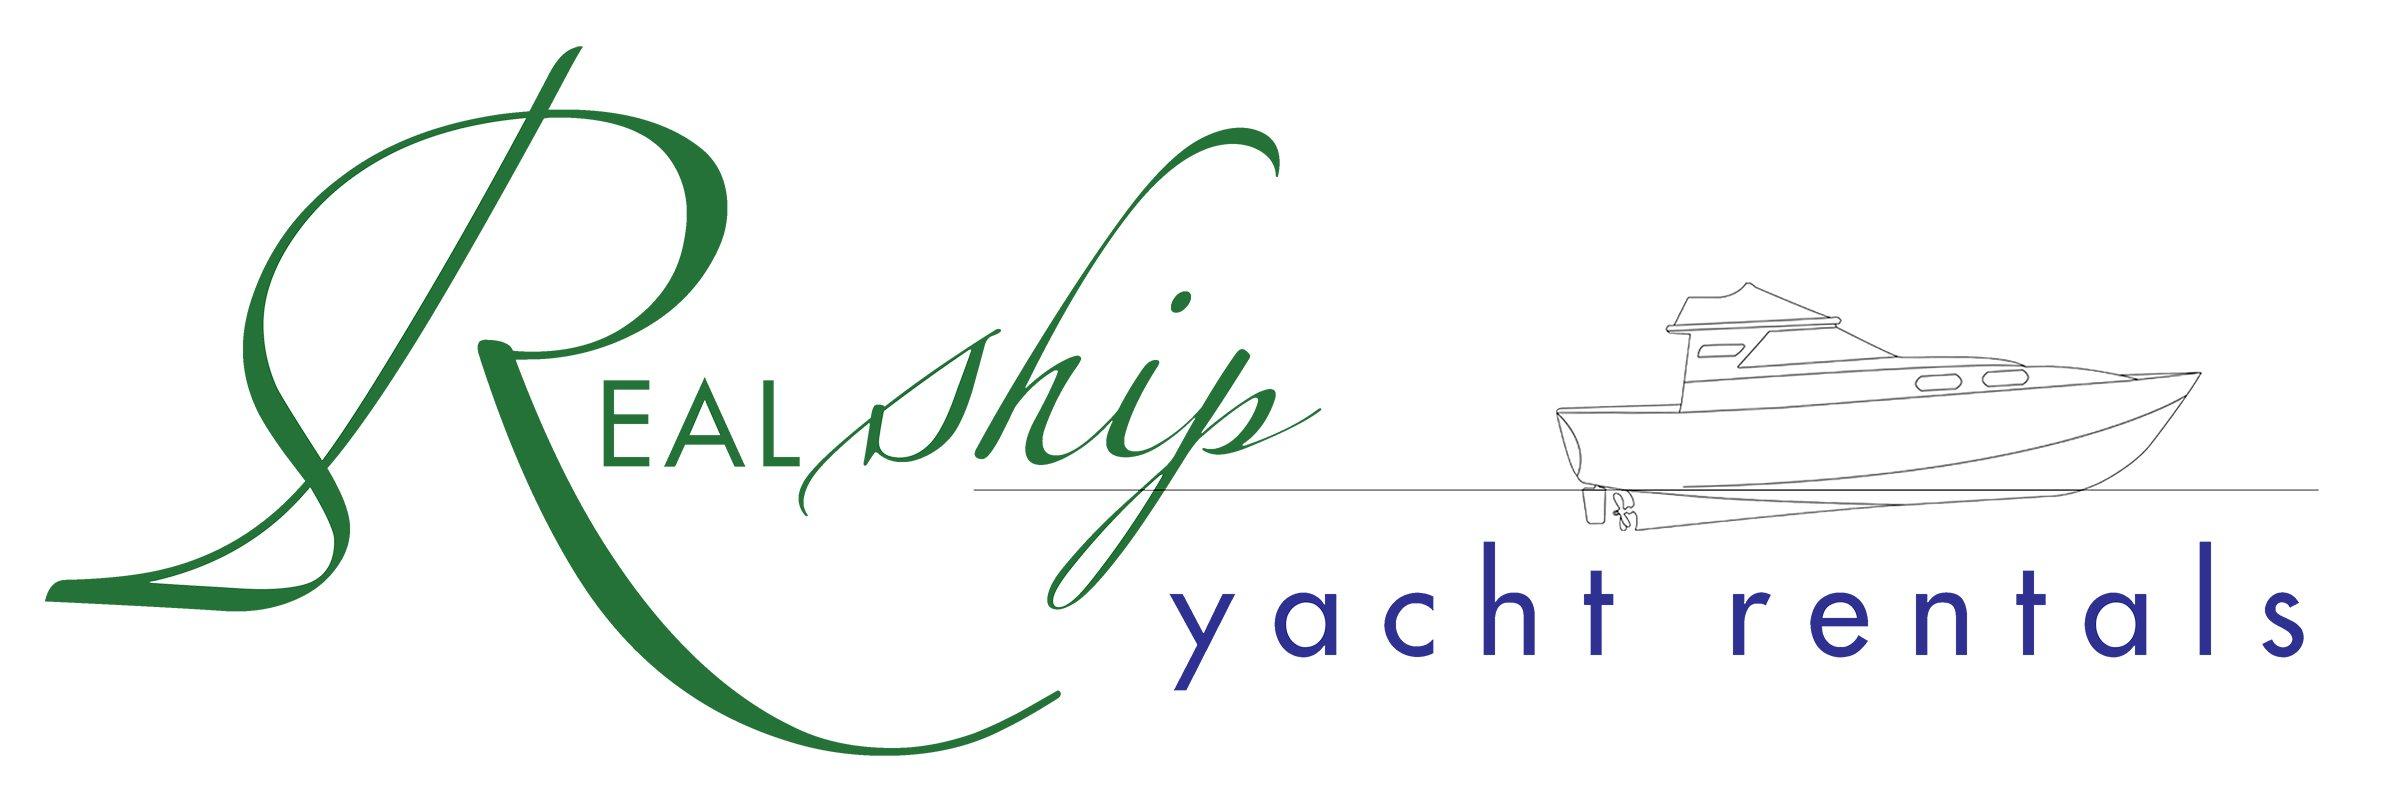 Realship Yachts